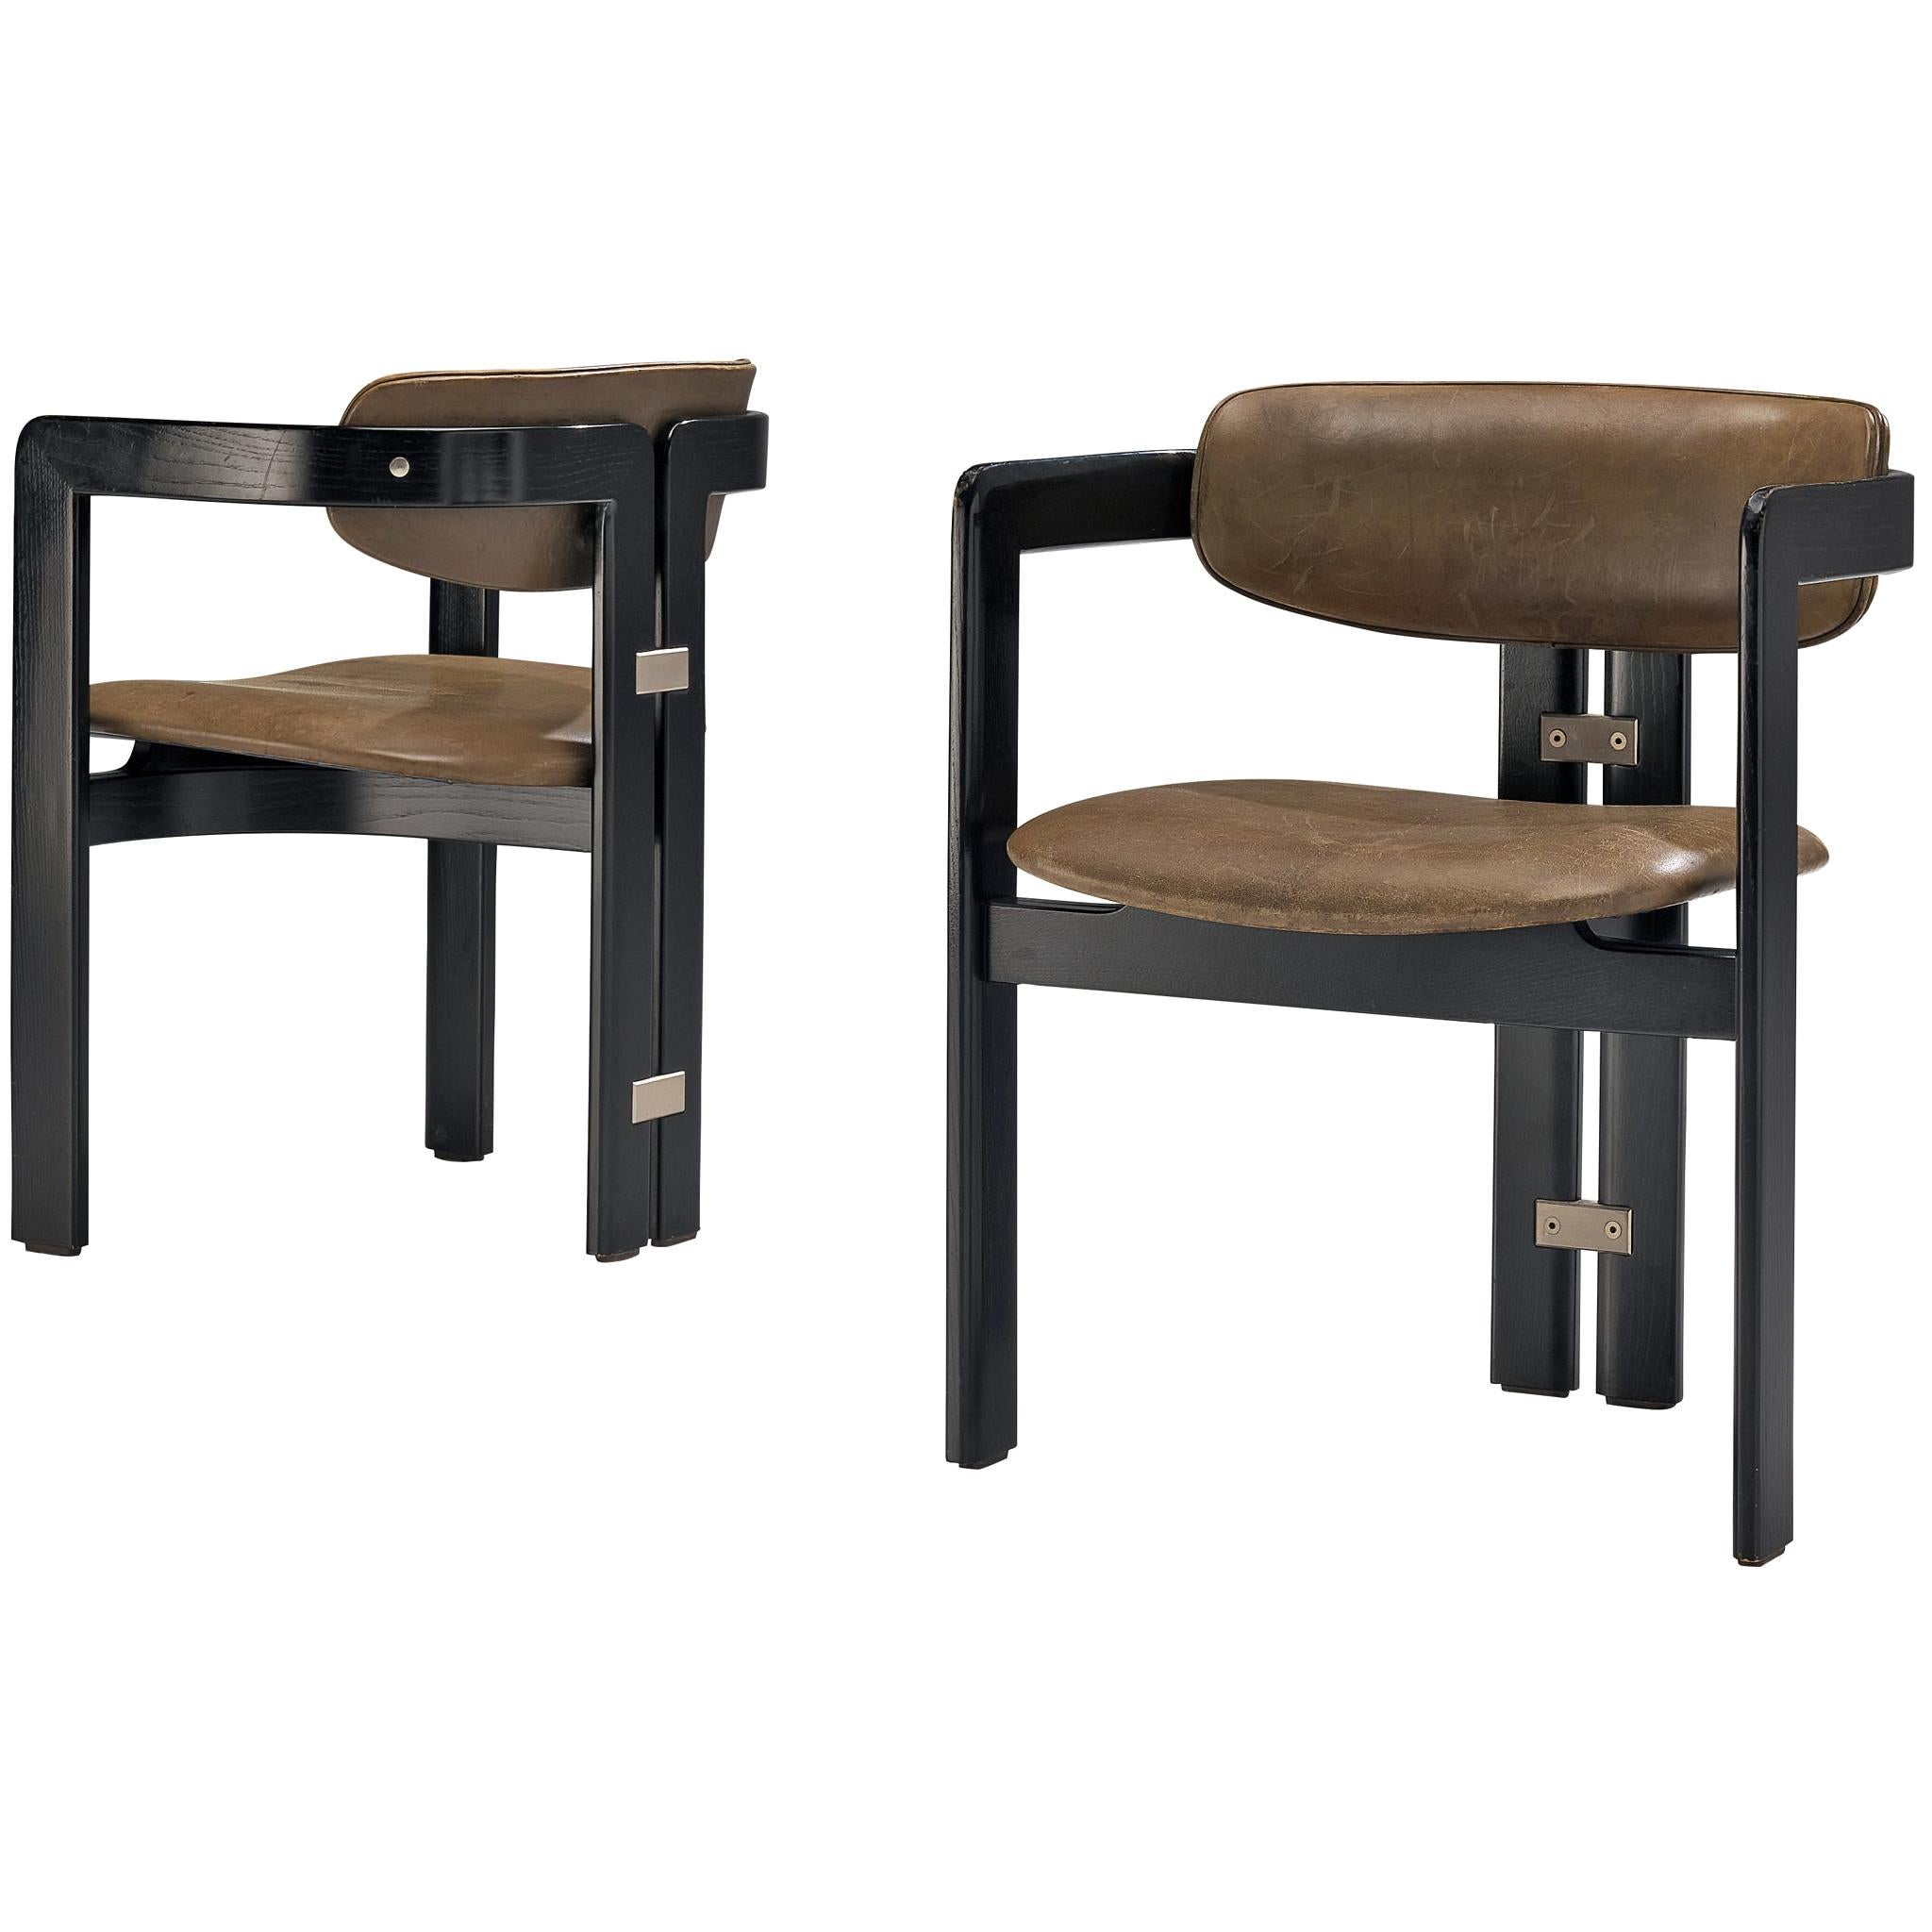 Augusto Savini 'Pamplona' Dining Chairs